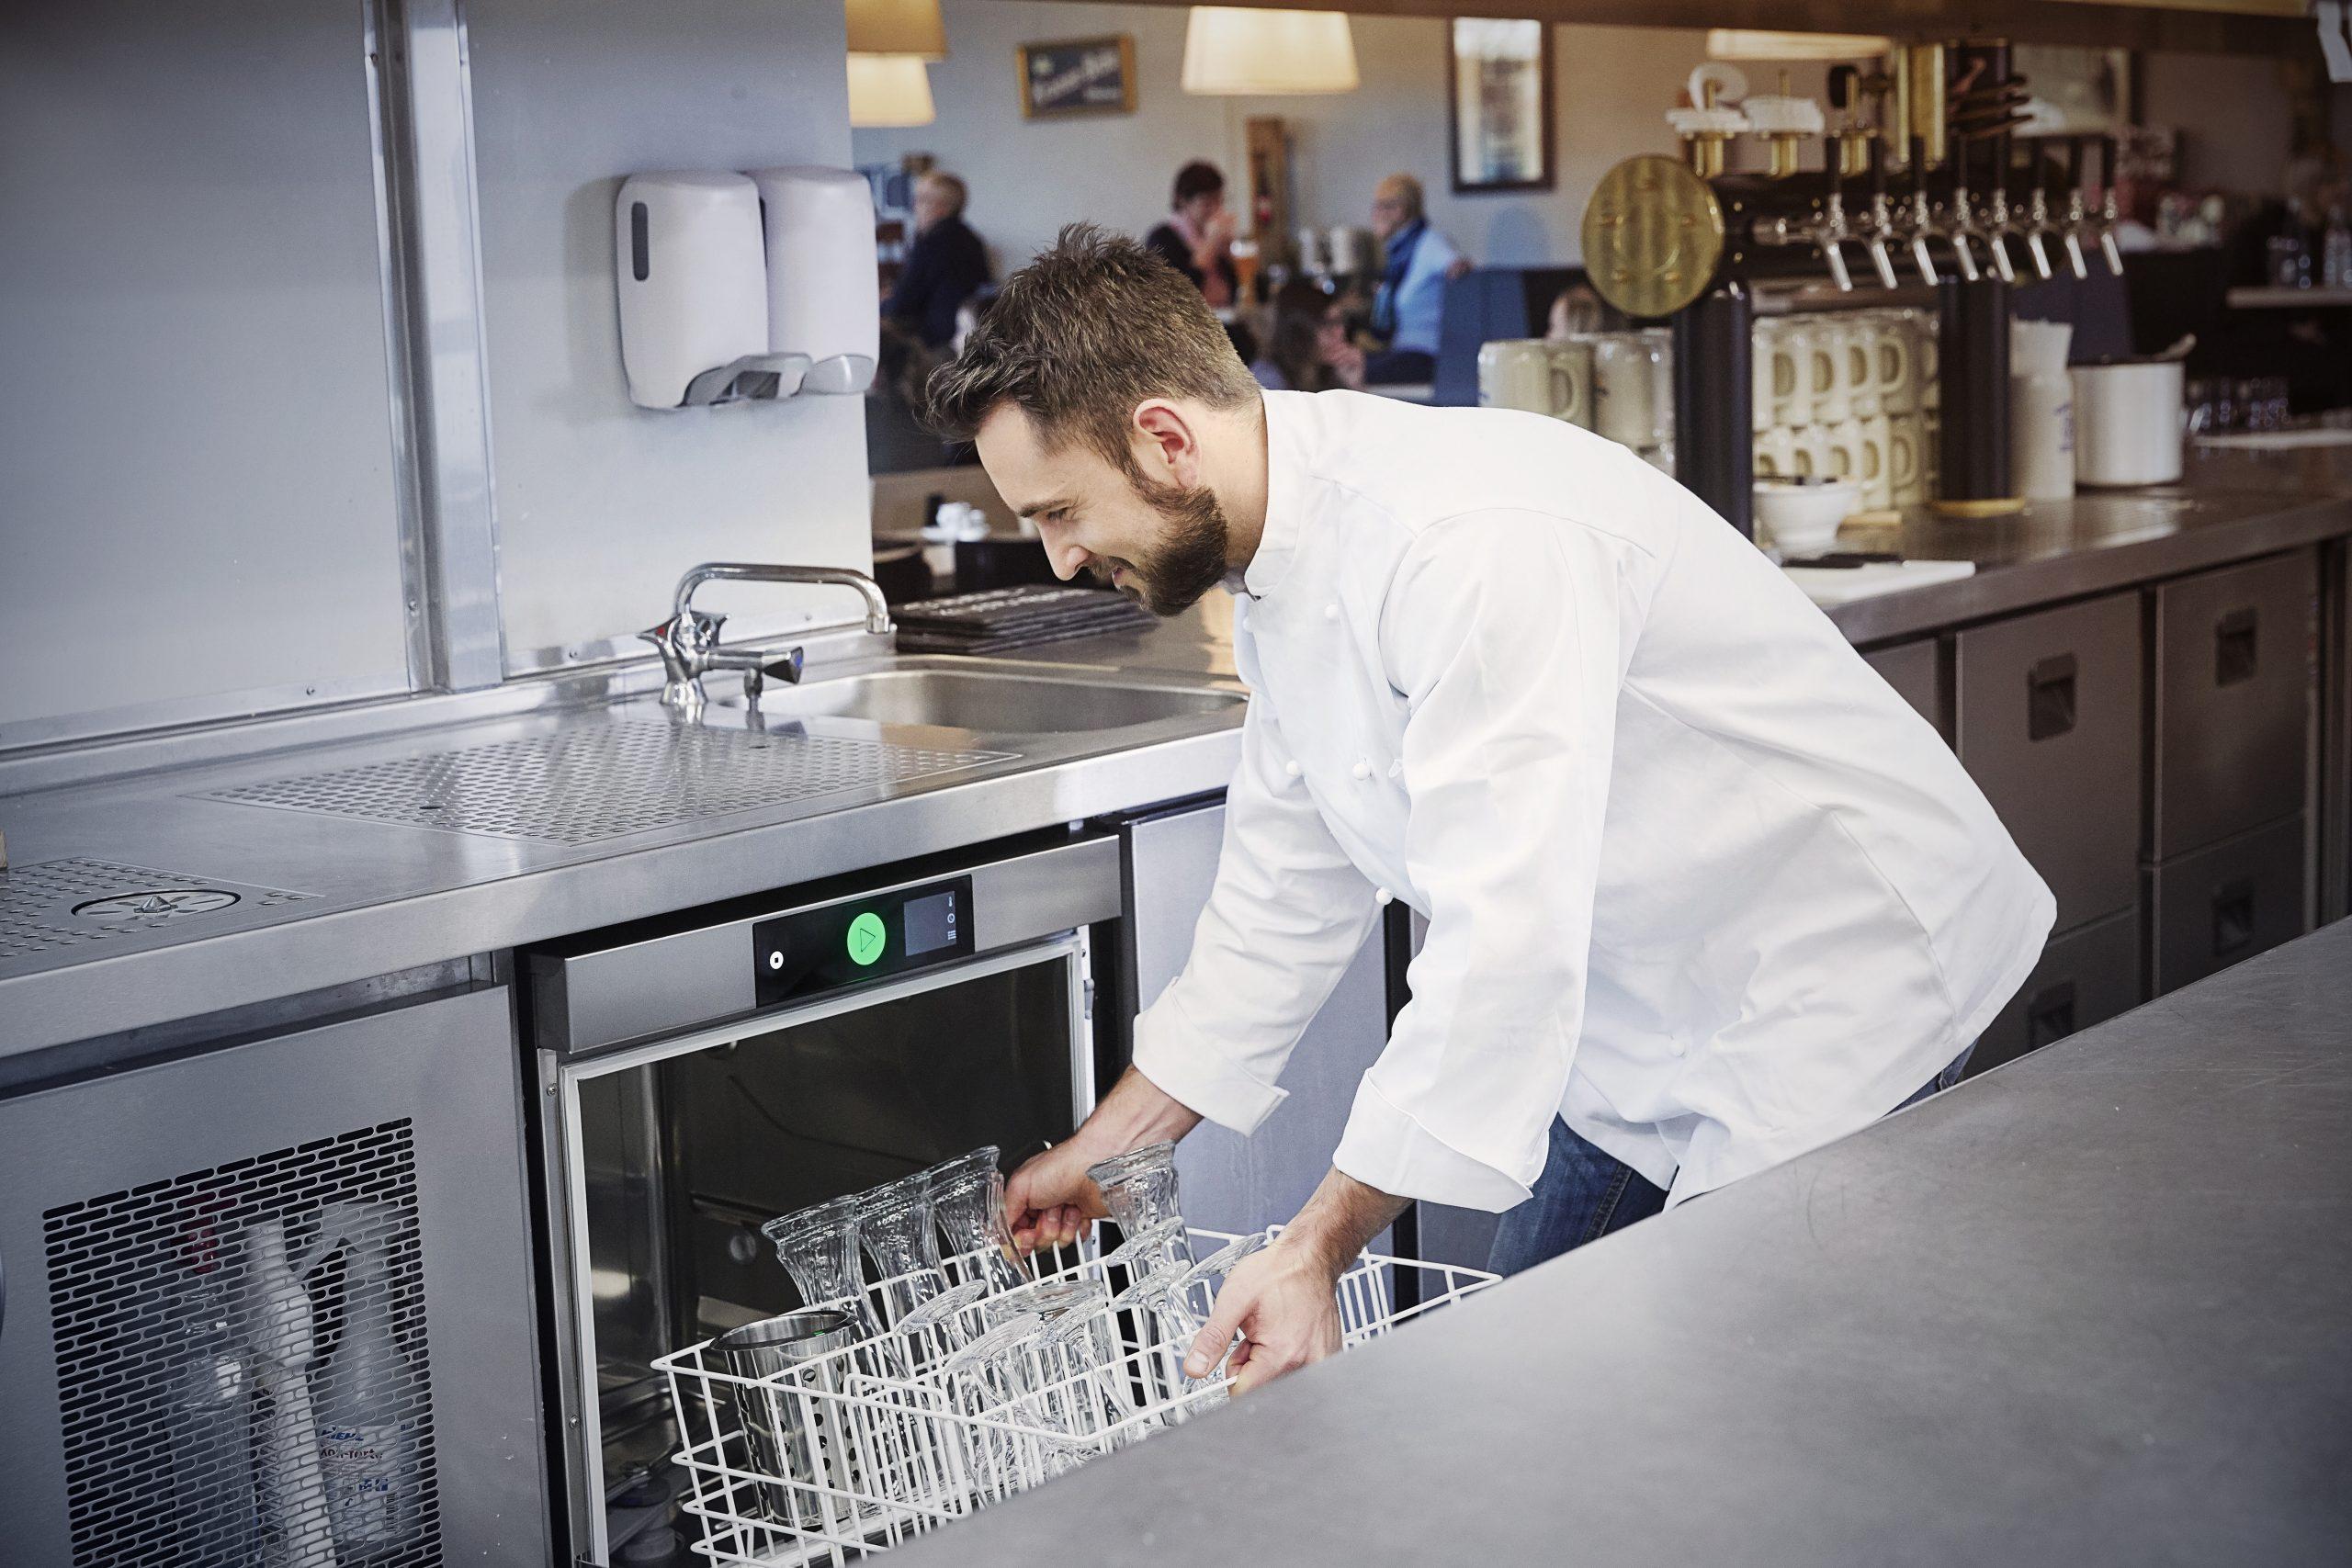 Chef filling dishwasher